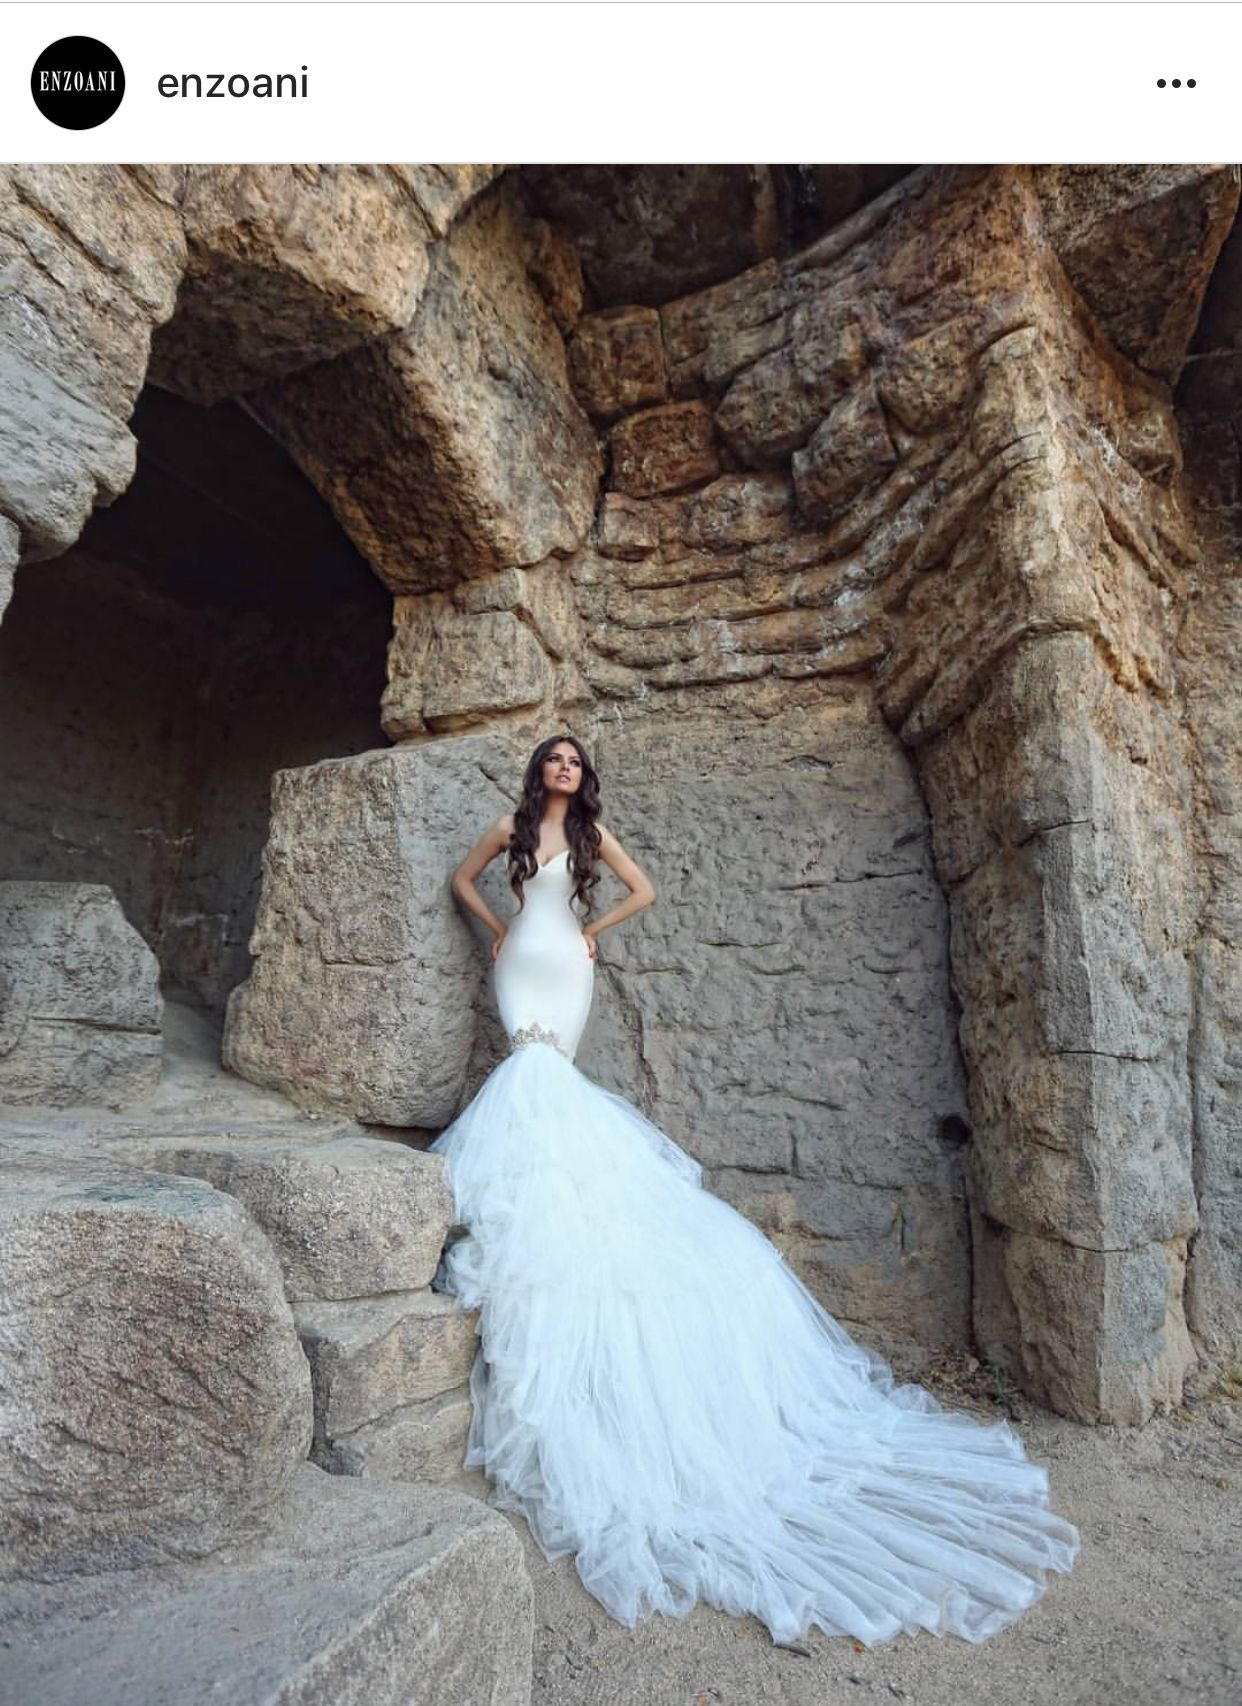 Pin by Mina Kamille on Dream Wedding Dresses | Pinterest | Dream ...